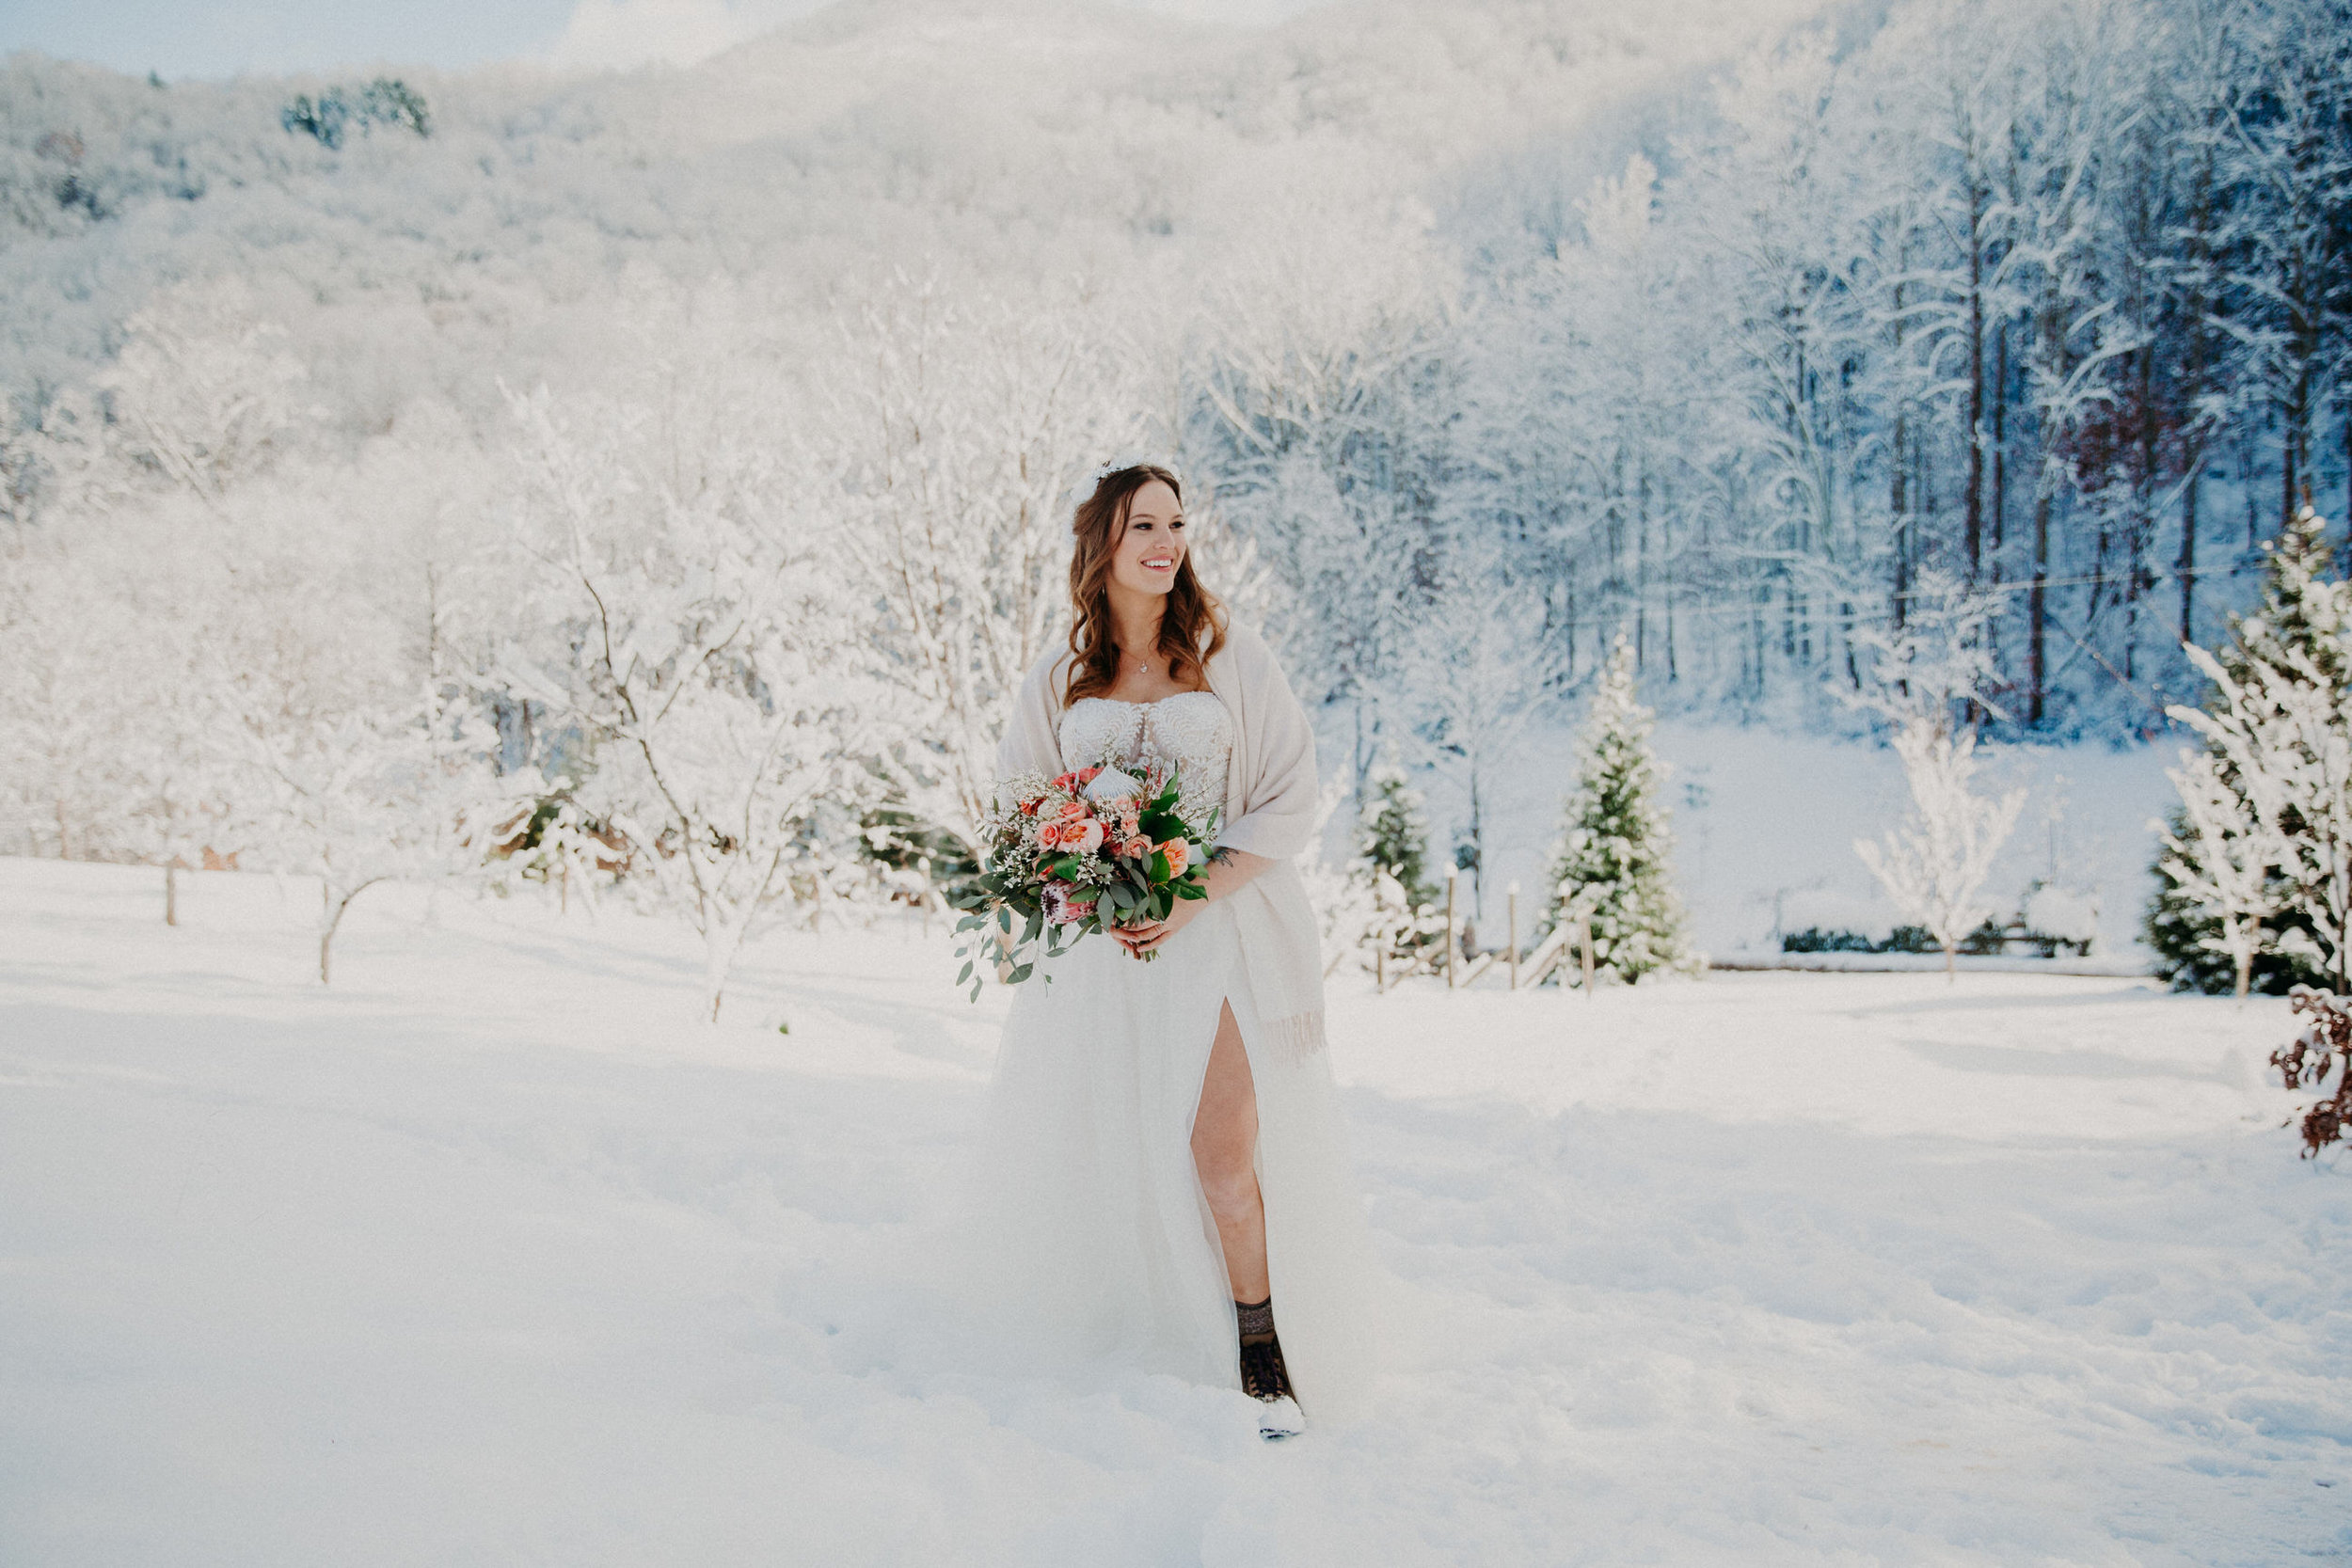 Surprise Snow Wedding -